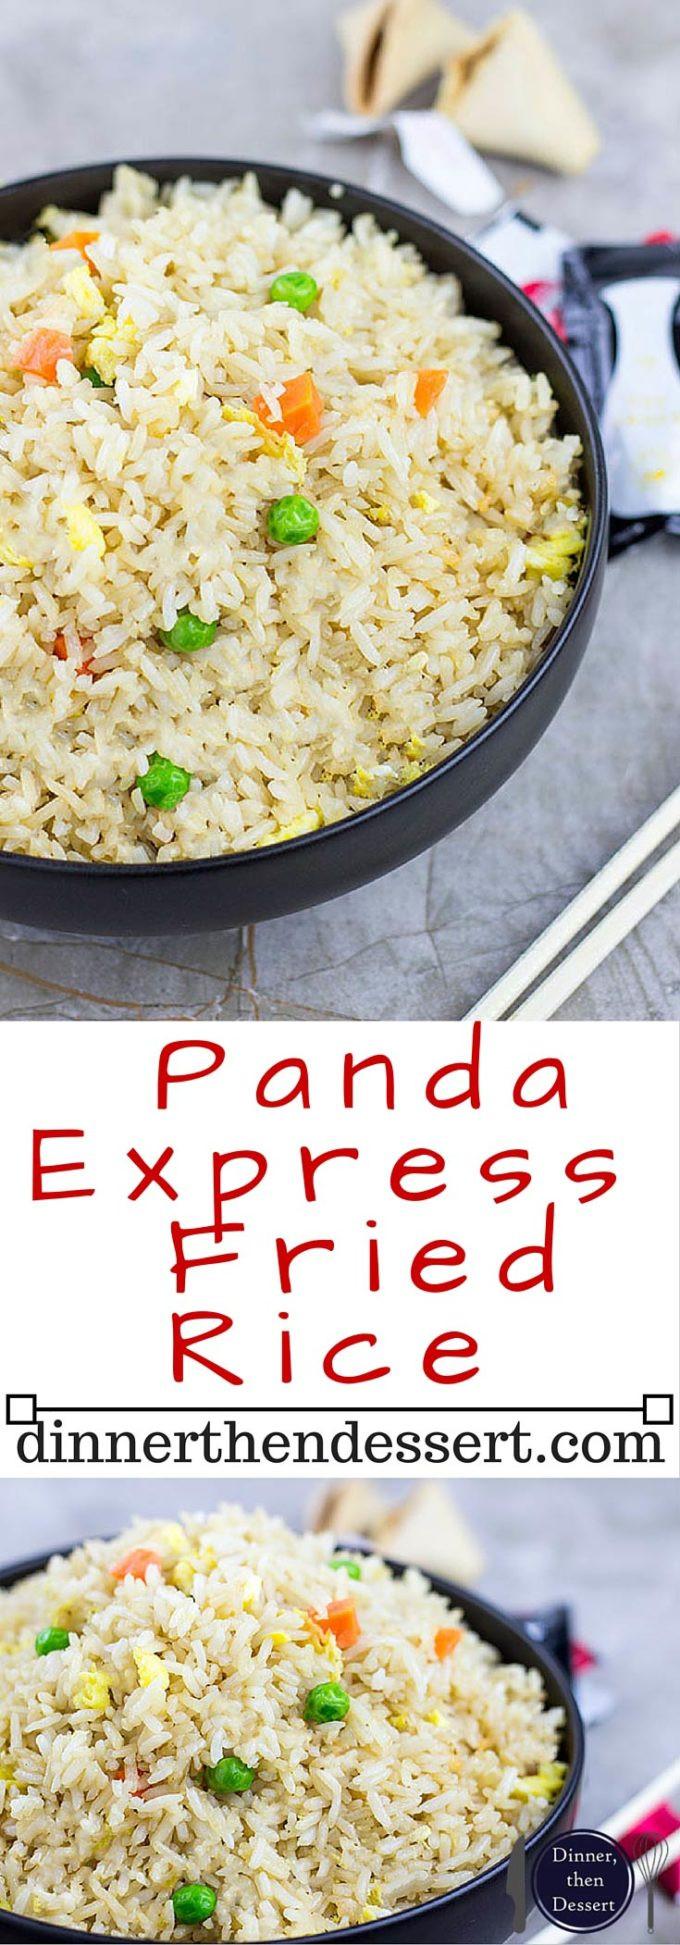 Panda Express Fried Rice  Panda Express Fried Rice Copycat Dinner then Dessert